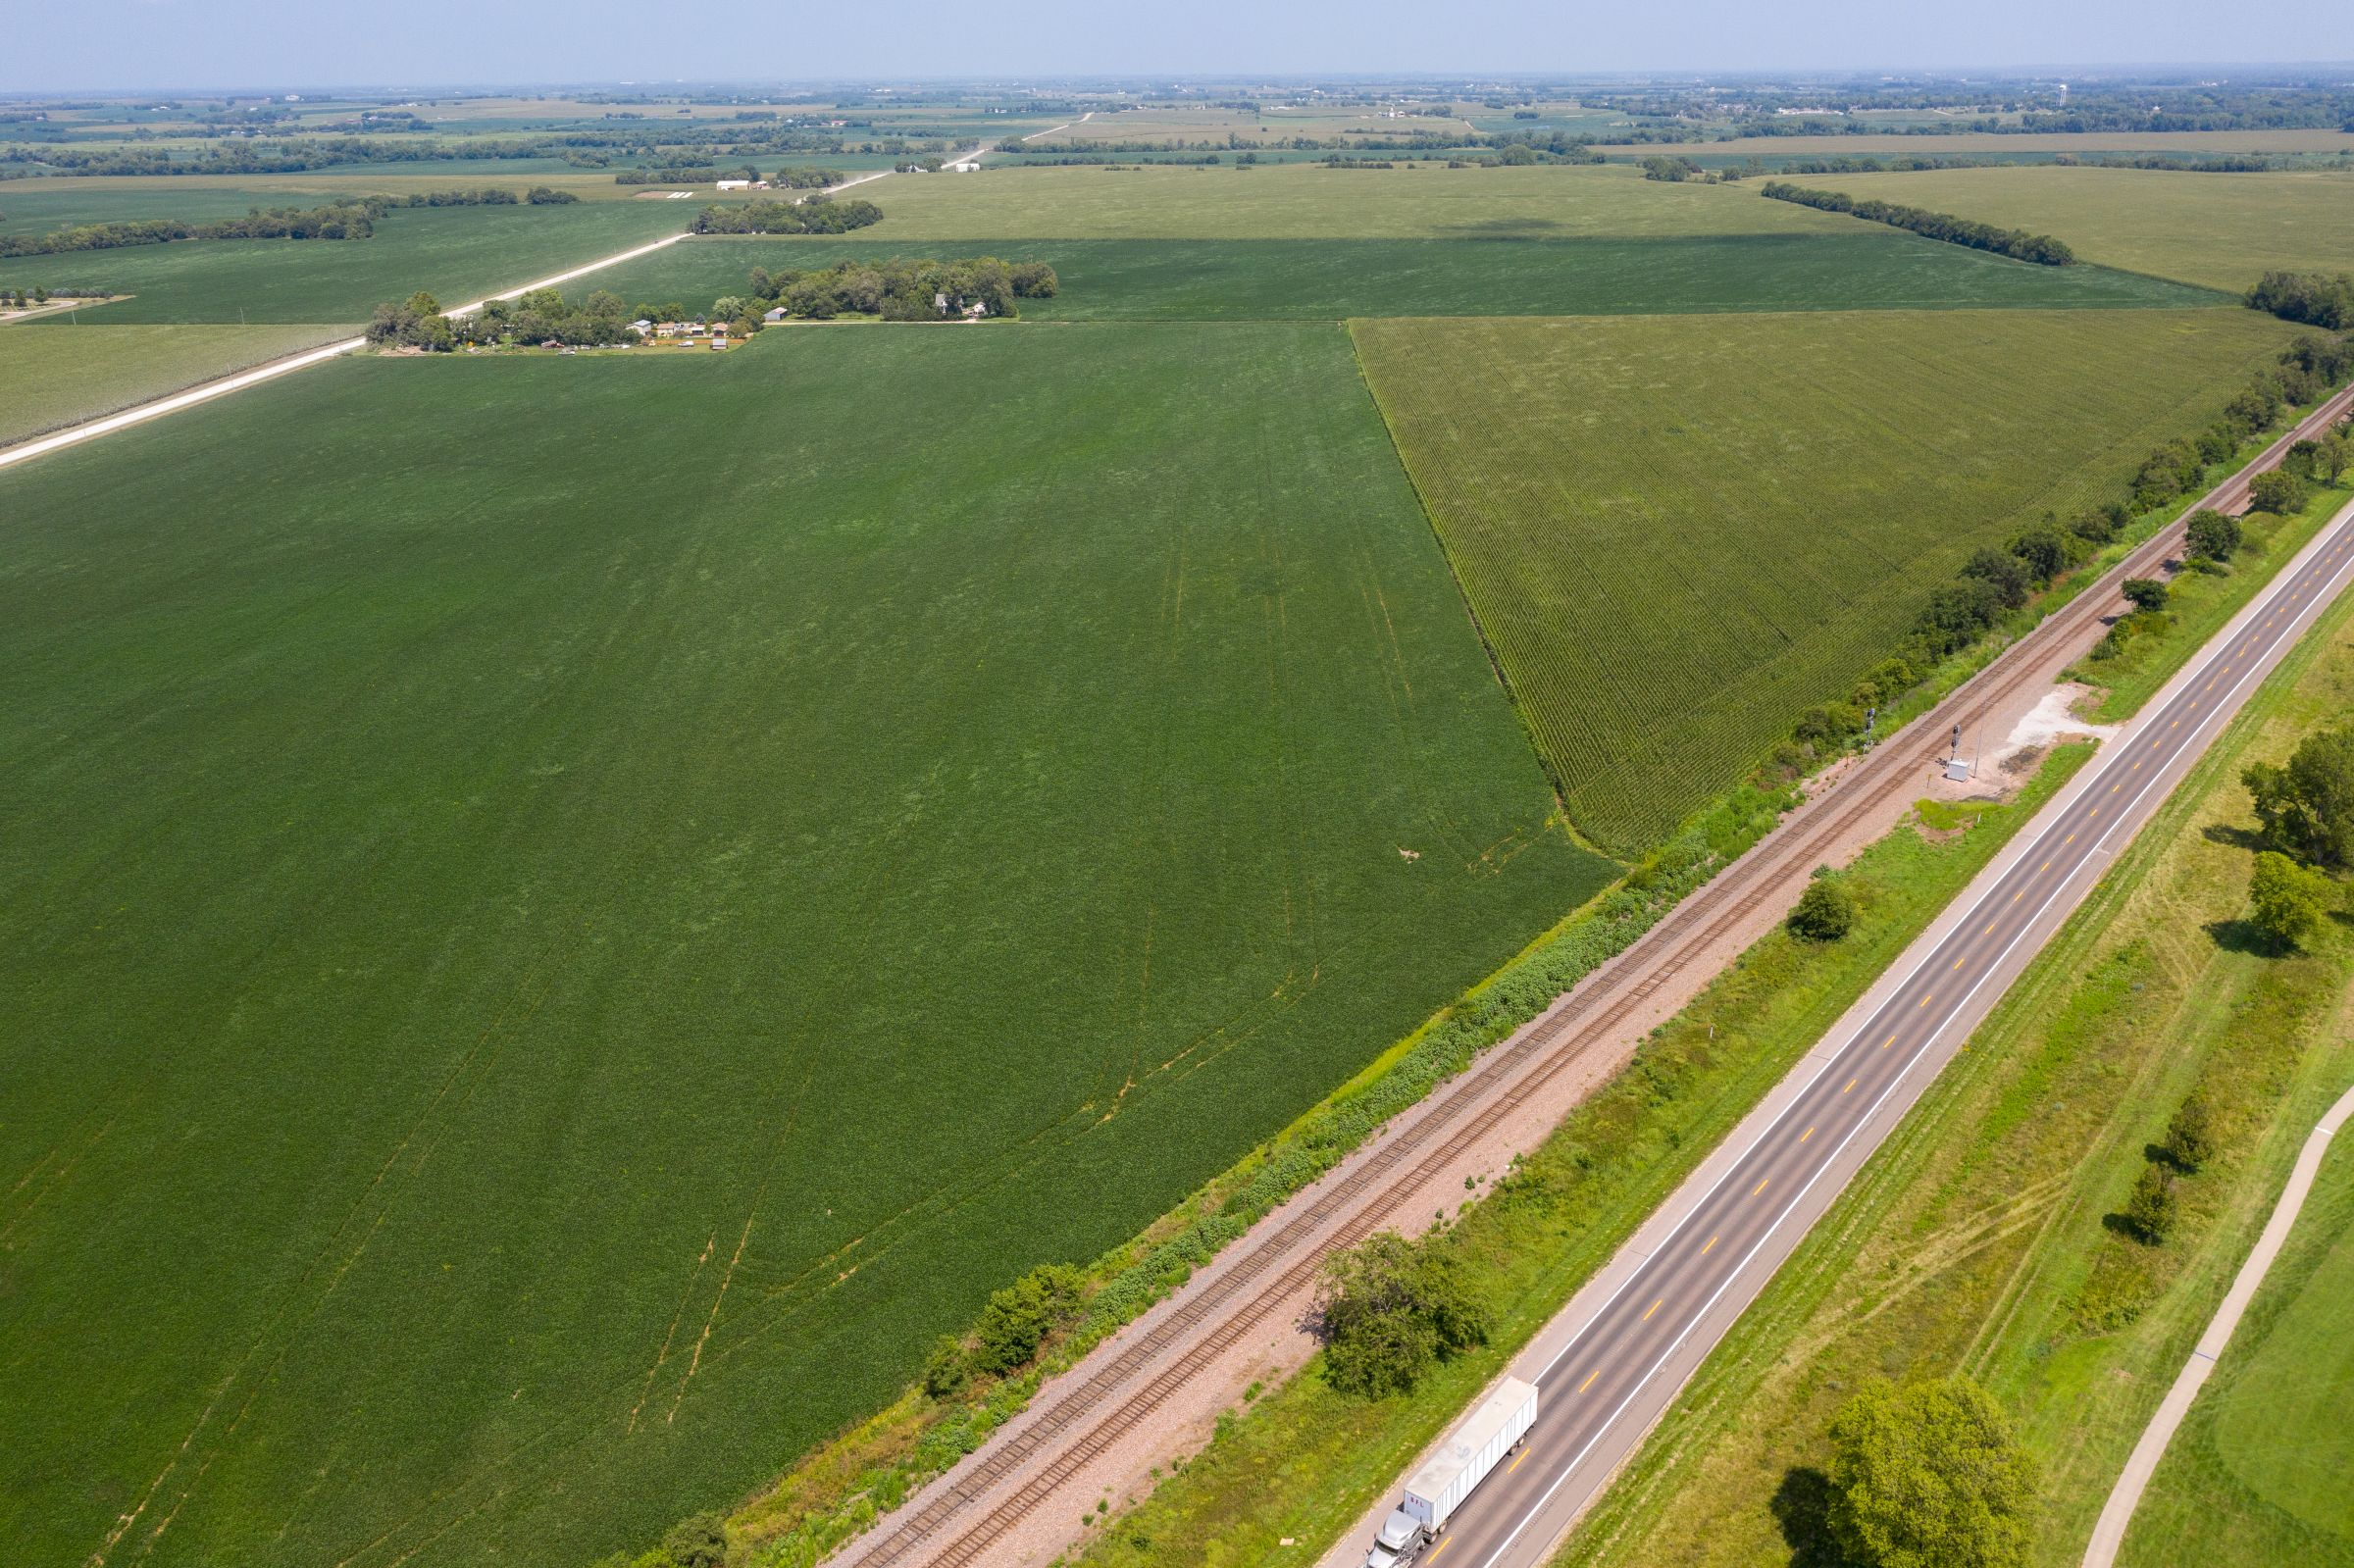 auctions-land-cass-county-nebraska-107-acres-listing-number-15713-3-2021-09-01-193835.jpeg